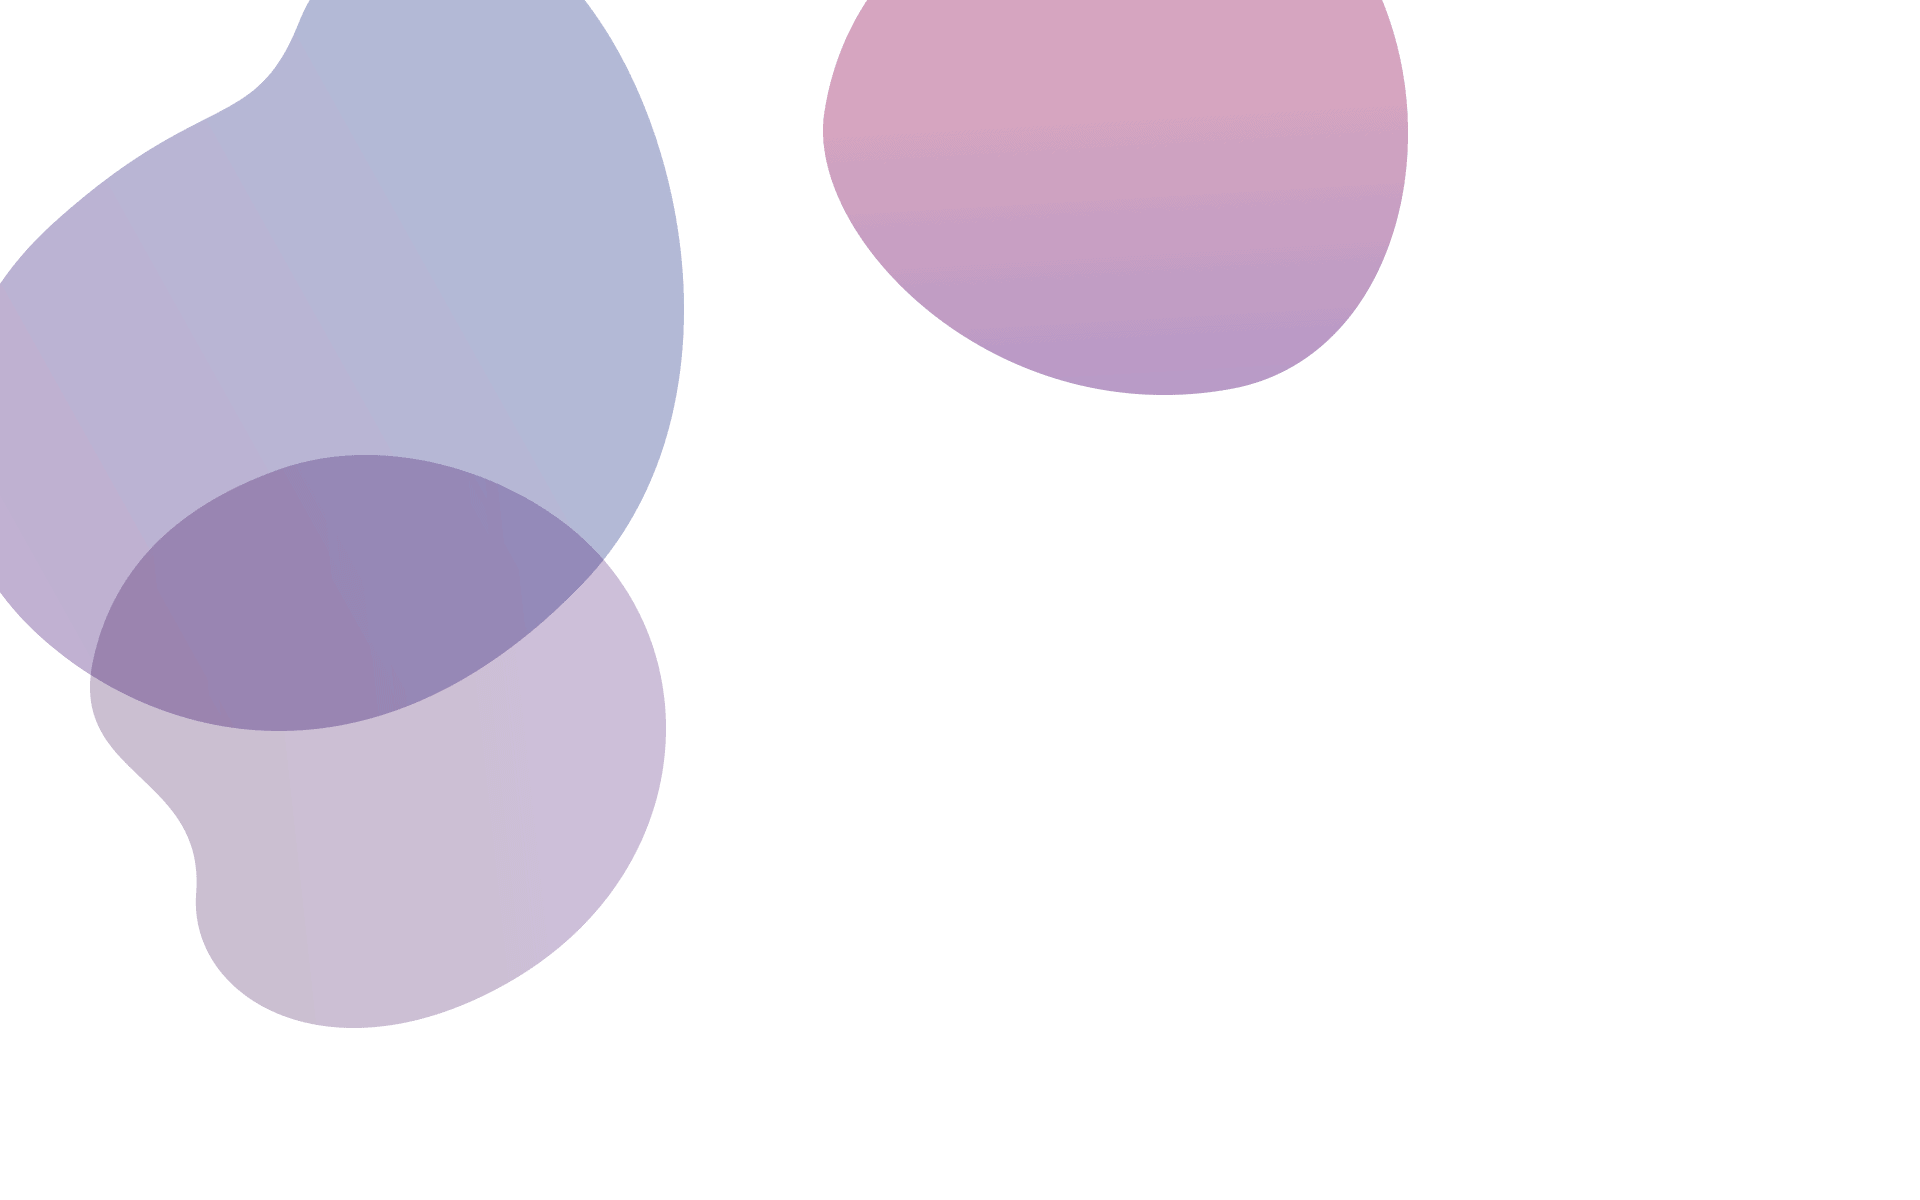 modern-shapes-bg.png